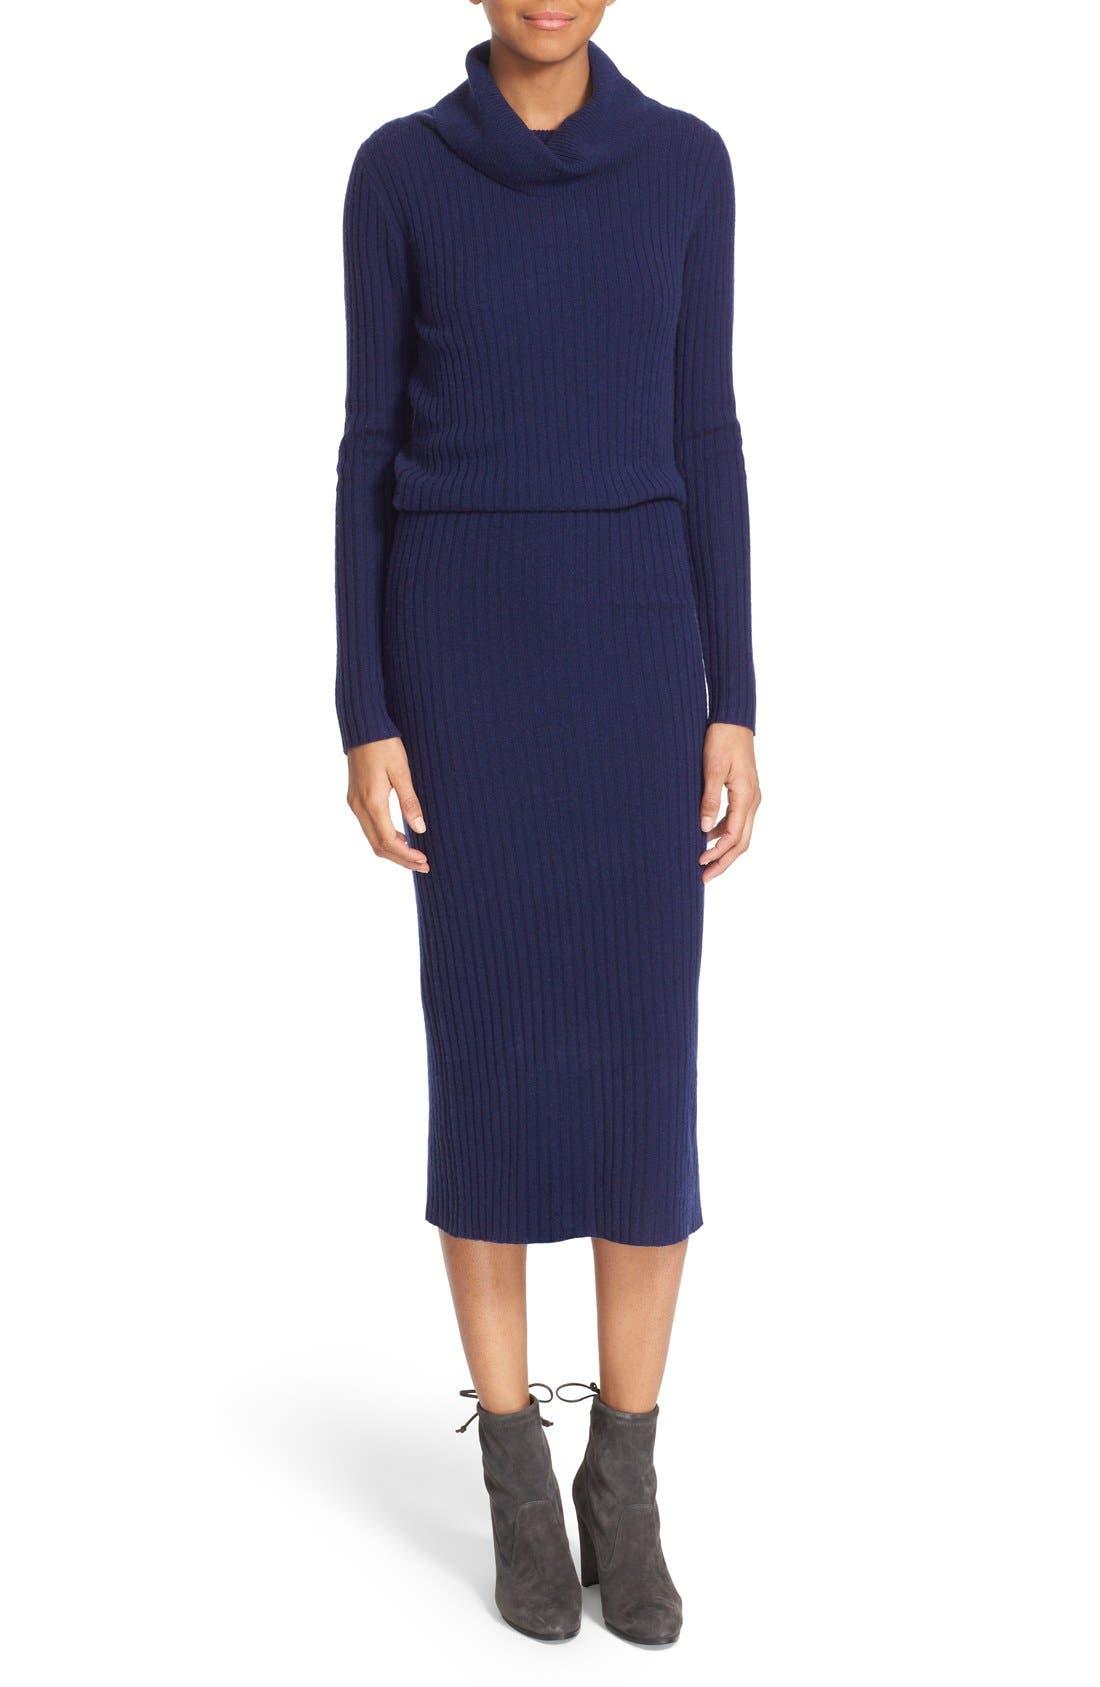 Main Image - Alice + Olivia 'Hailee' Cowl Neck Blouson Sweater Dress